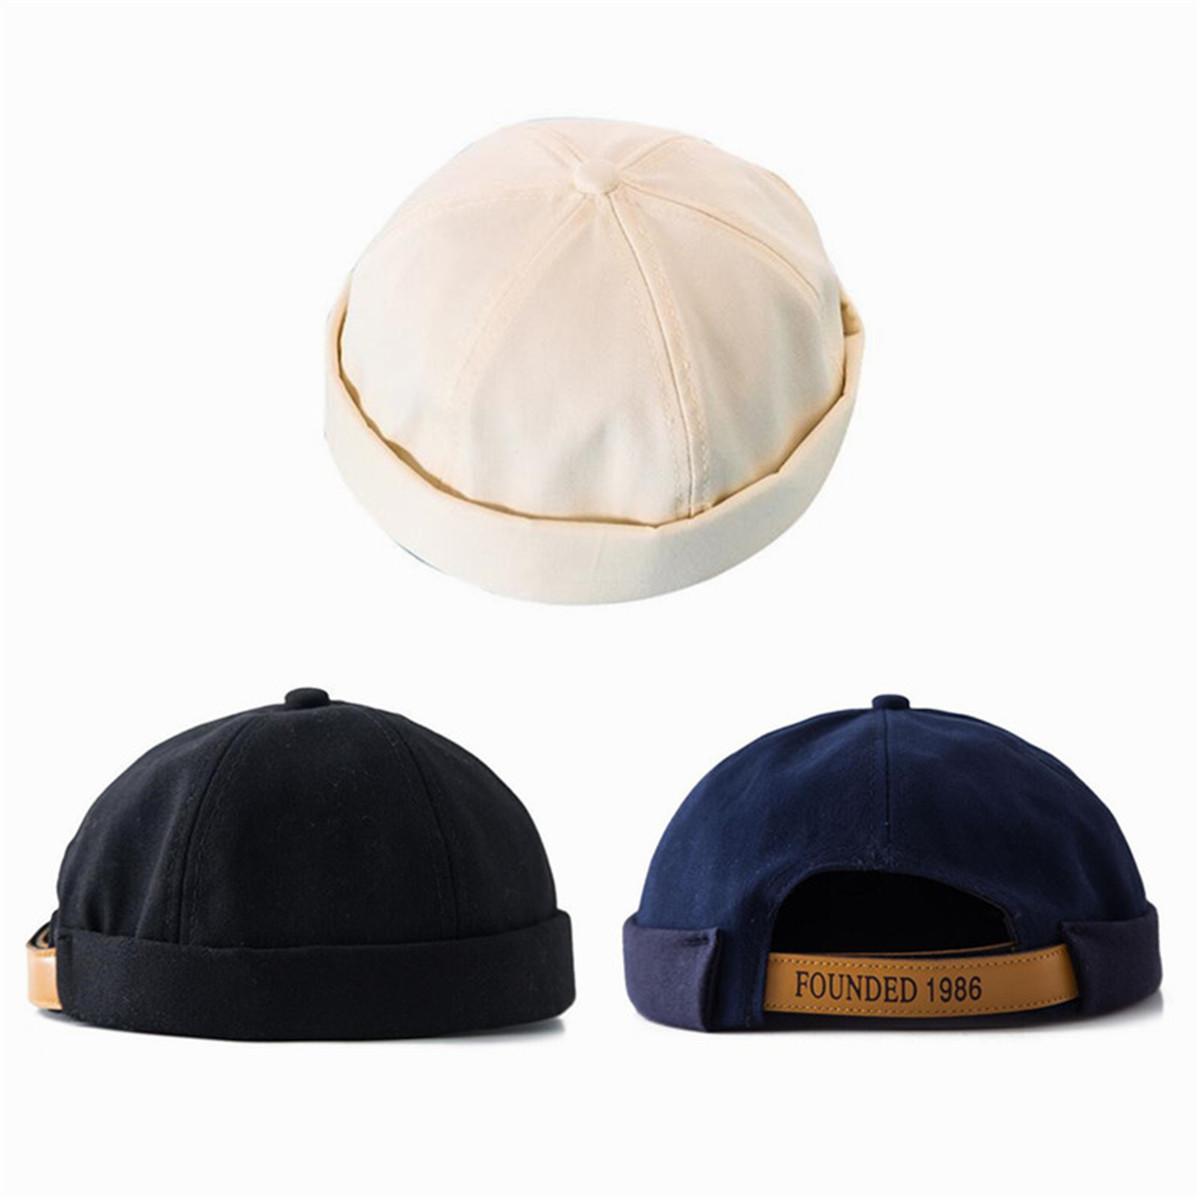 d1d4fd4a7ae Details about Men Unisex Street Casual Docker Sailor Biker Hat Loop Beanie  Brimless Cap Gift